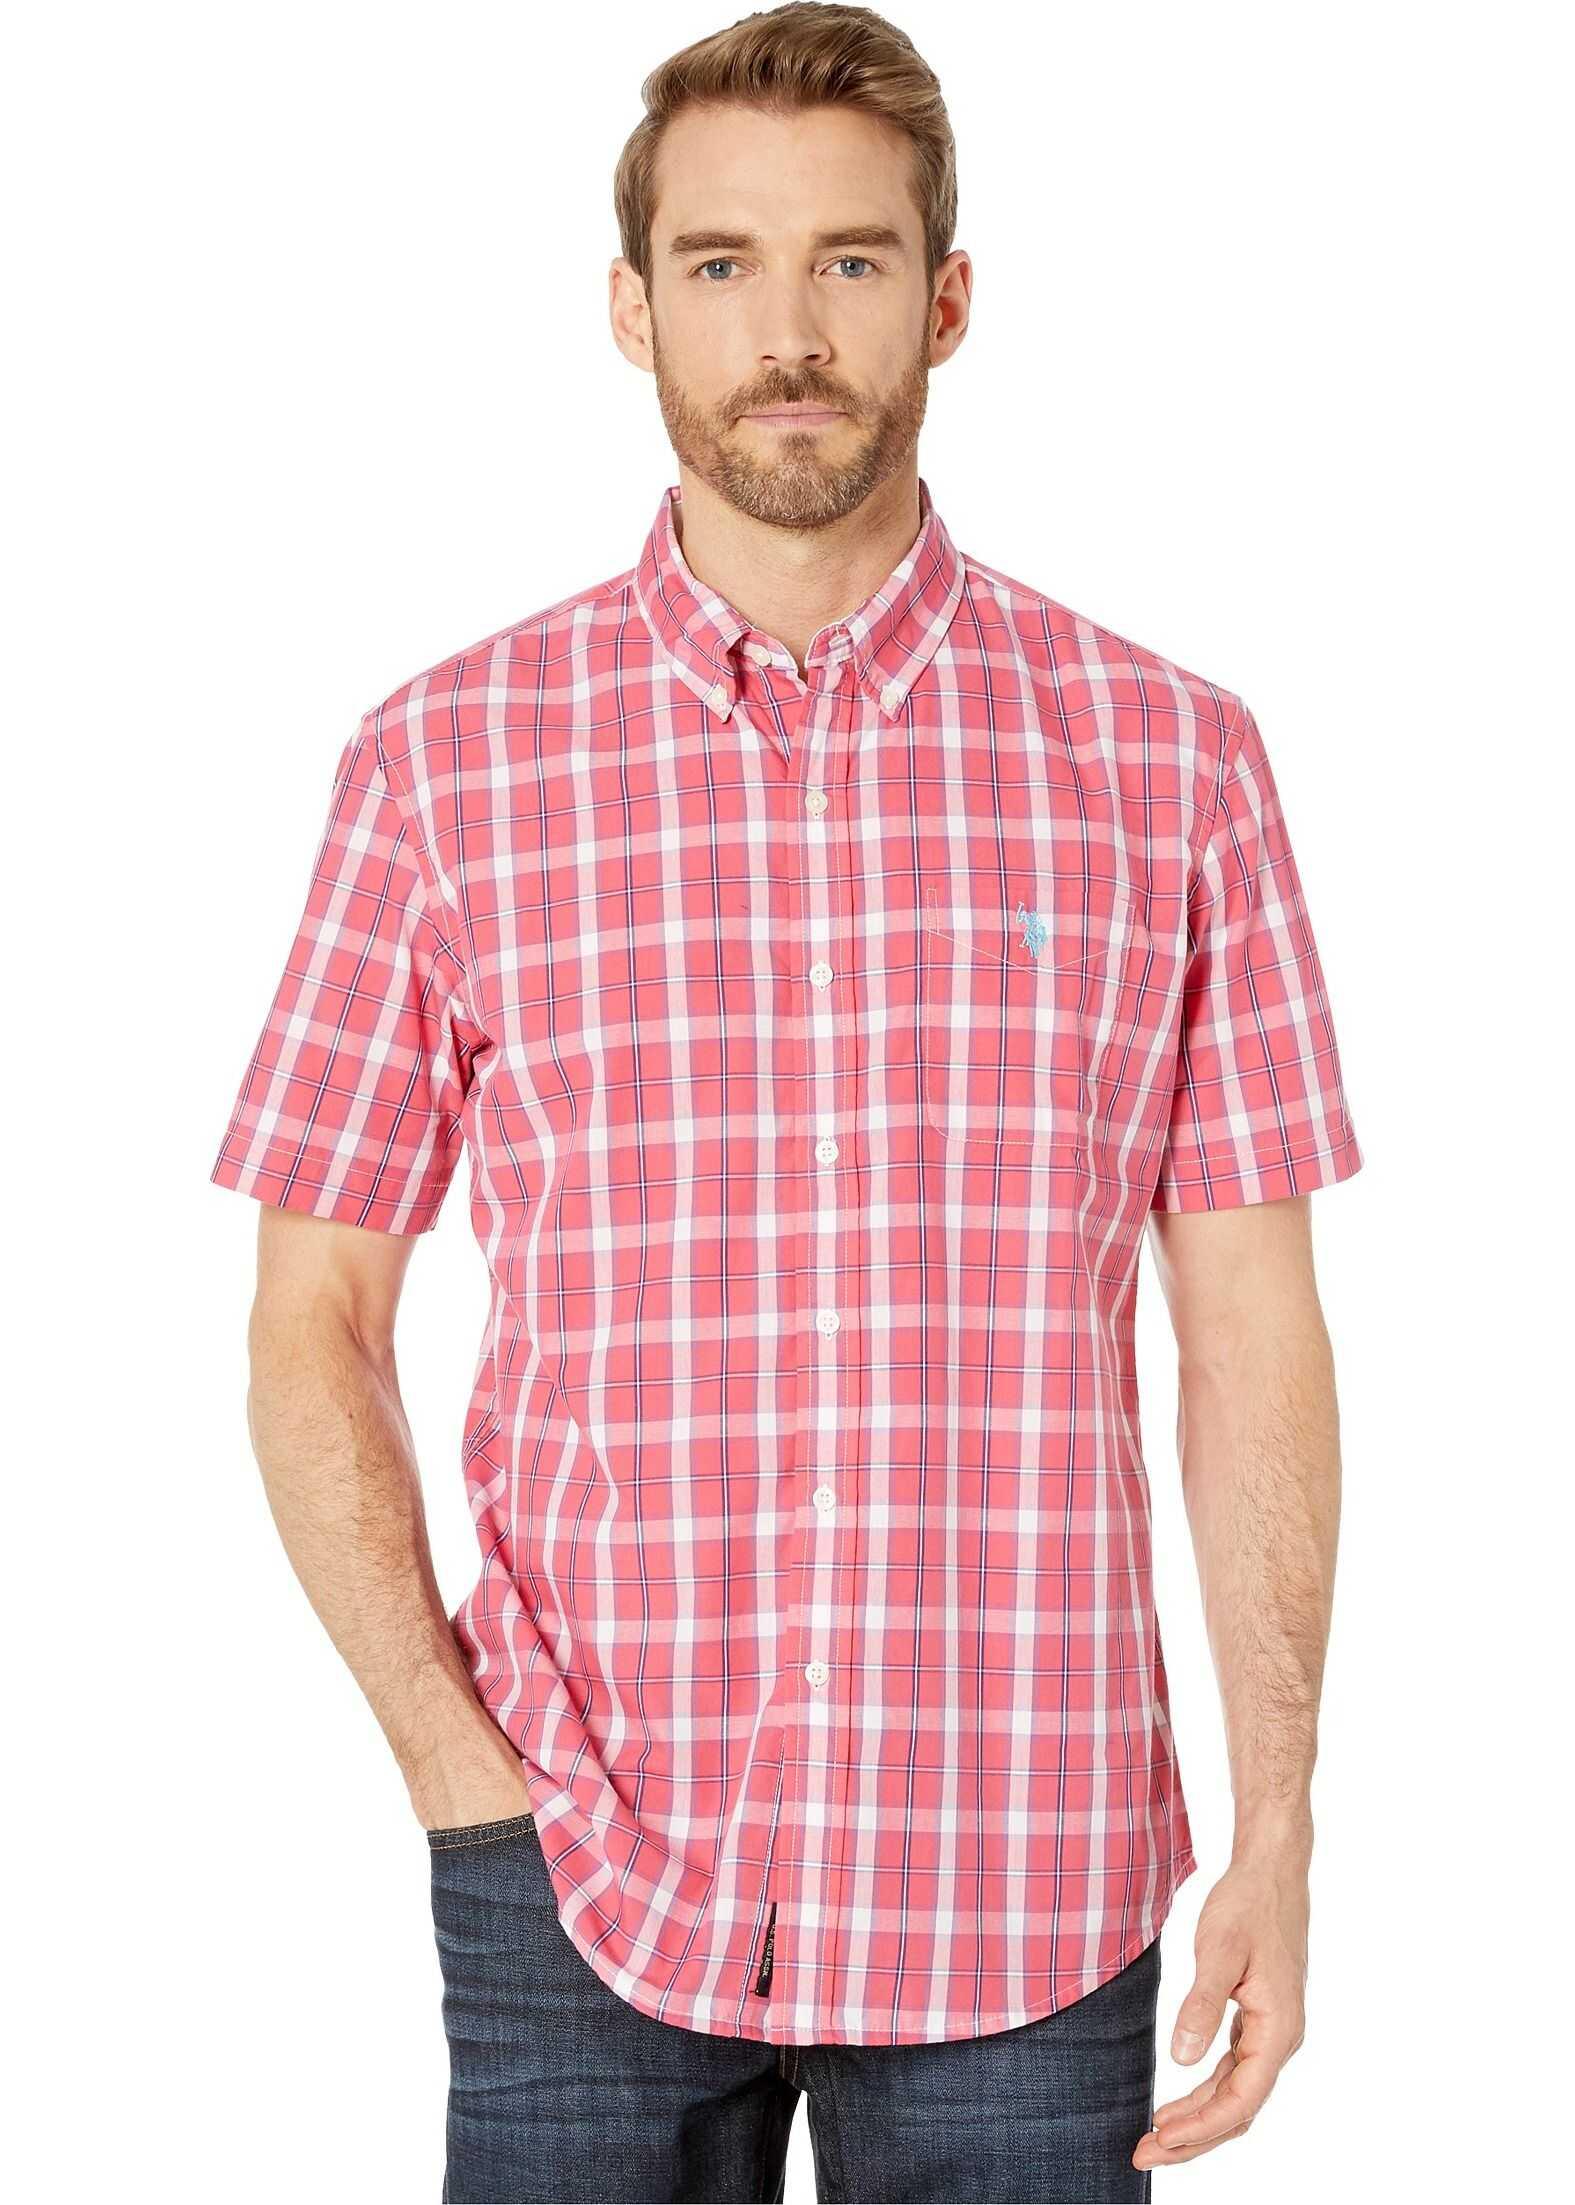 U.S. POLO ASSN. Short Sleeve Medium Plaid Woven Celebrity Pink